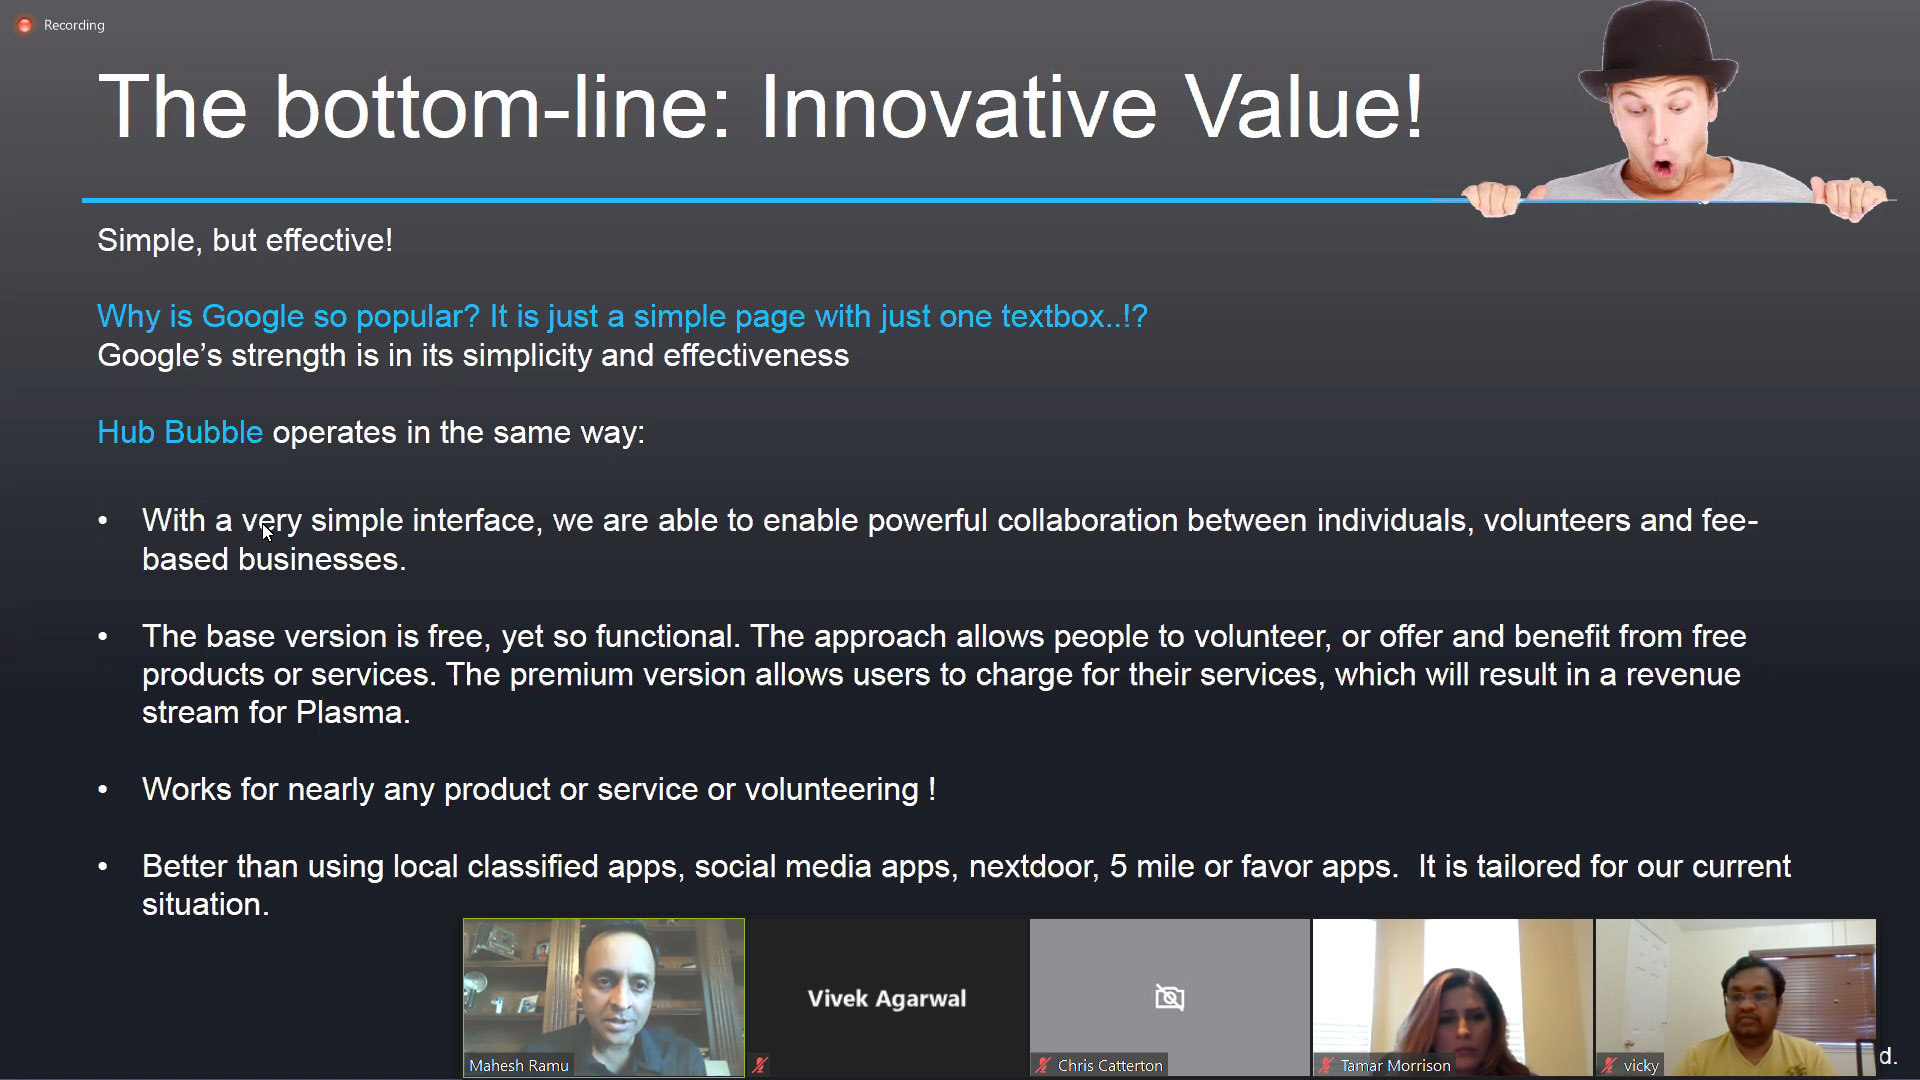 Innovative Value